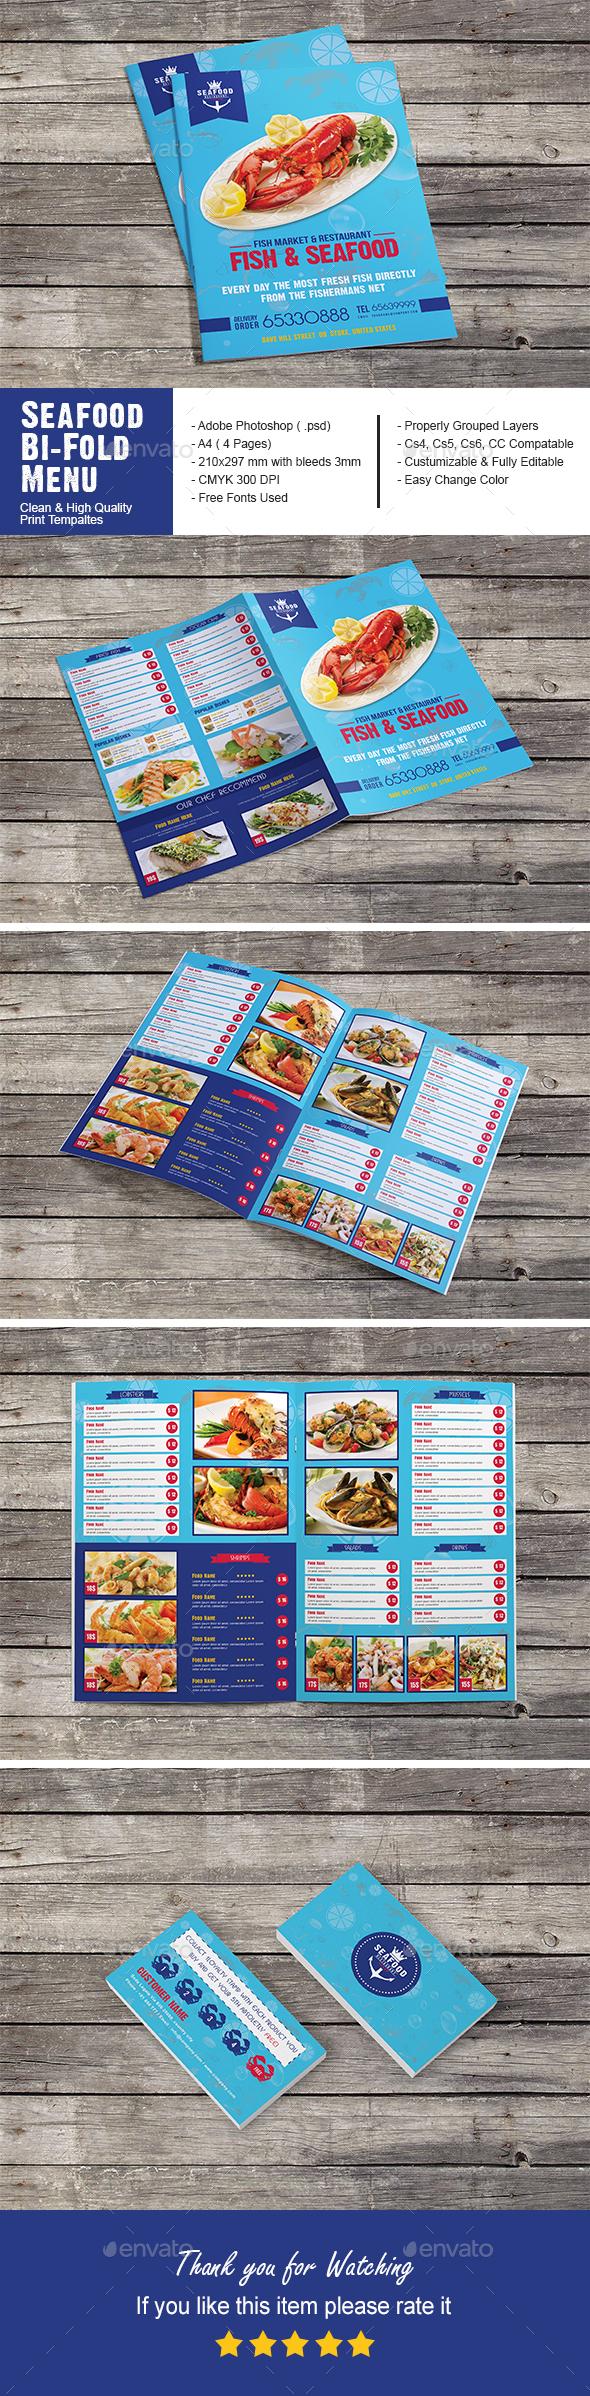 Seafood Restaurant Bi-Fold Menu - Food Menus Print Templates